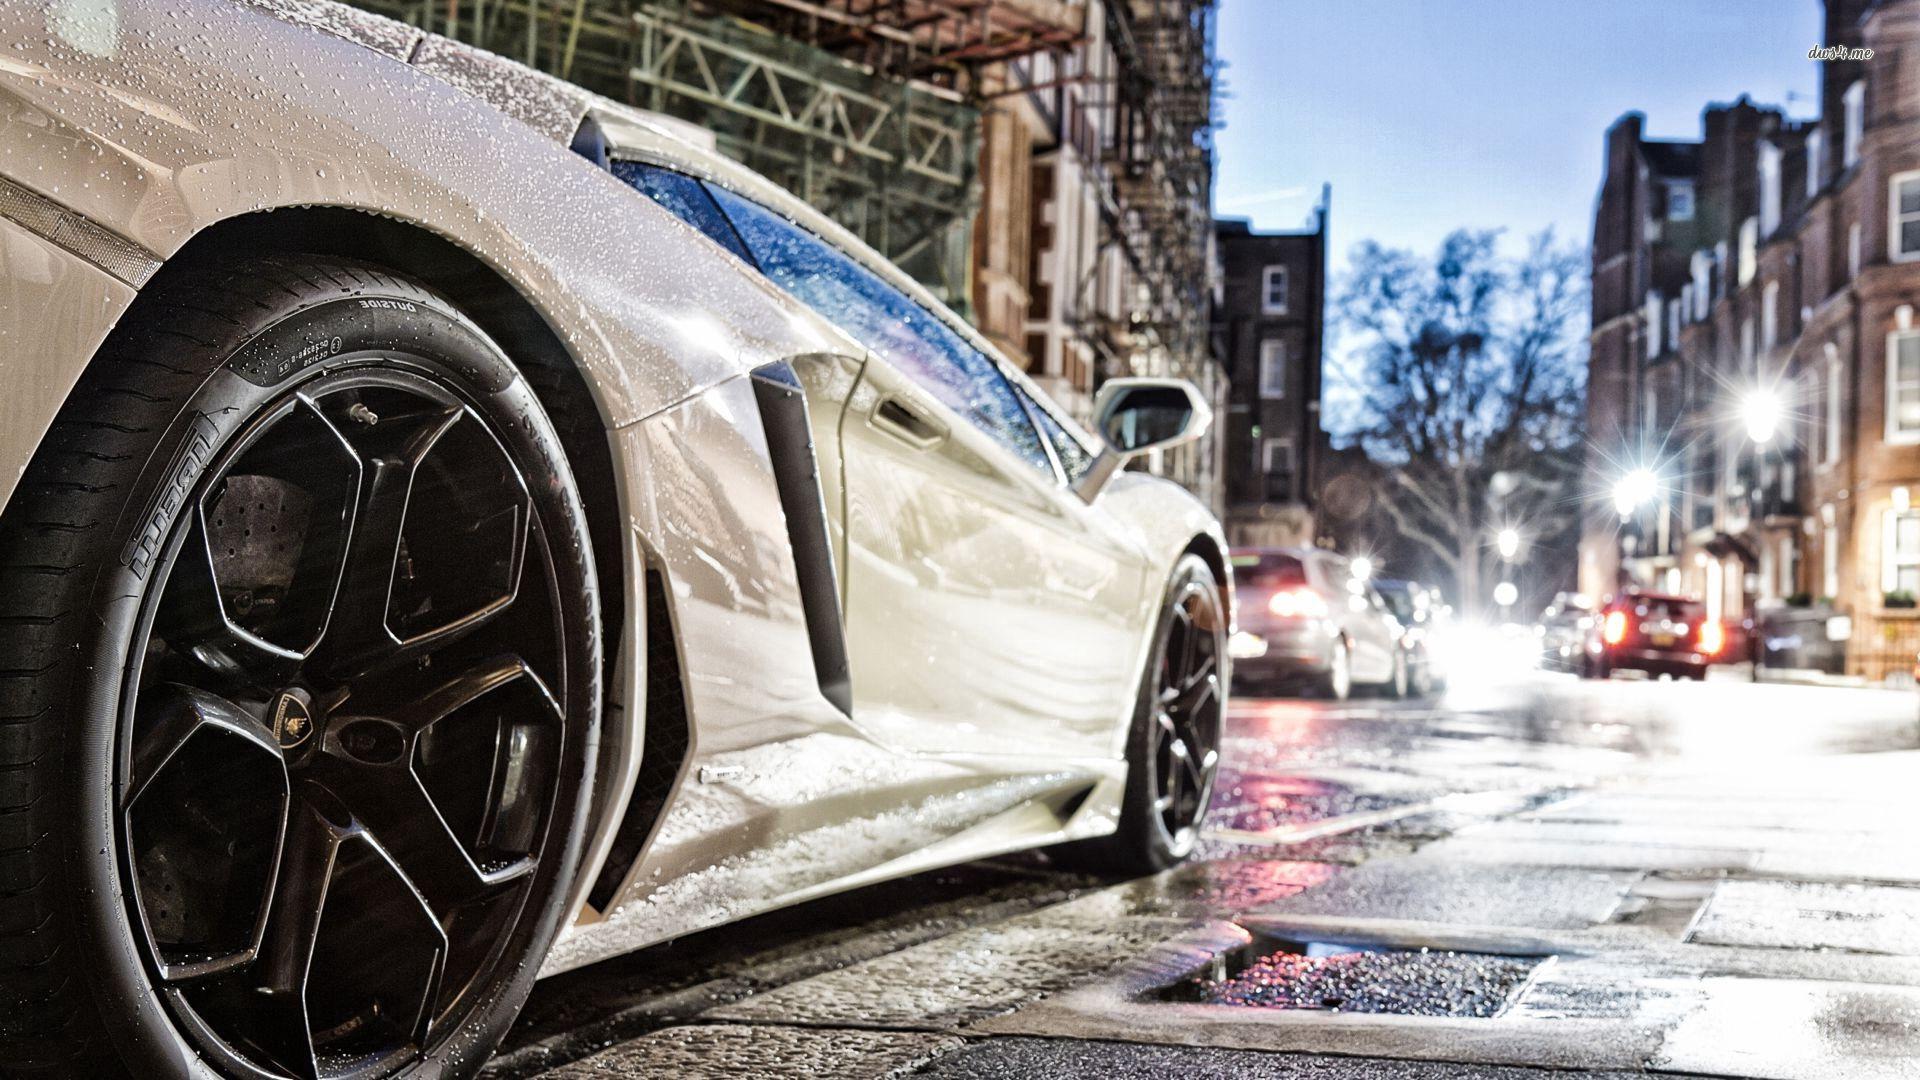 The Best Wallpapers Related to Lambo, Lamborghini, Car, Ride